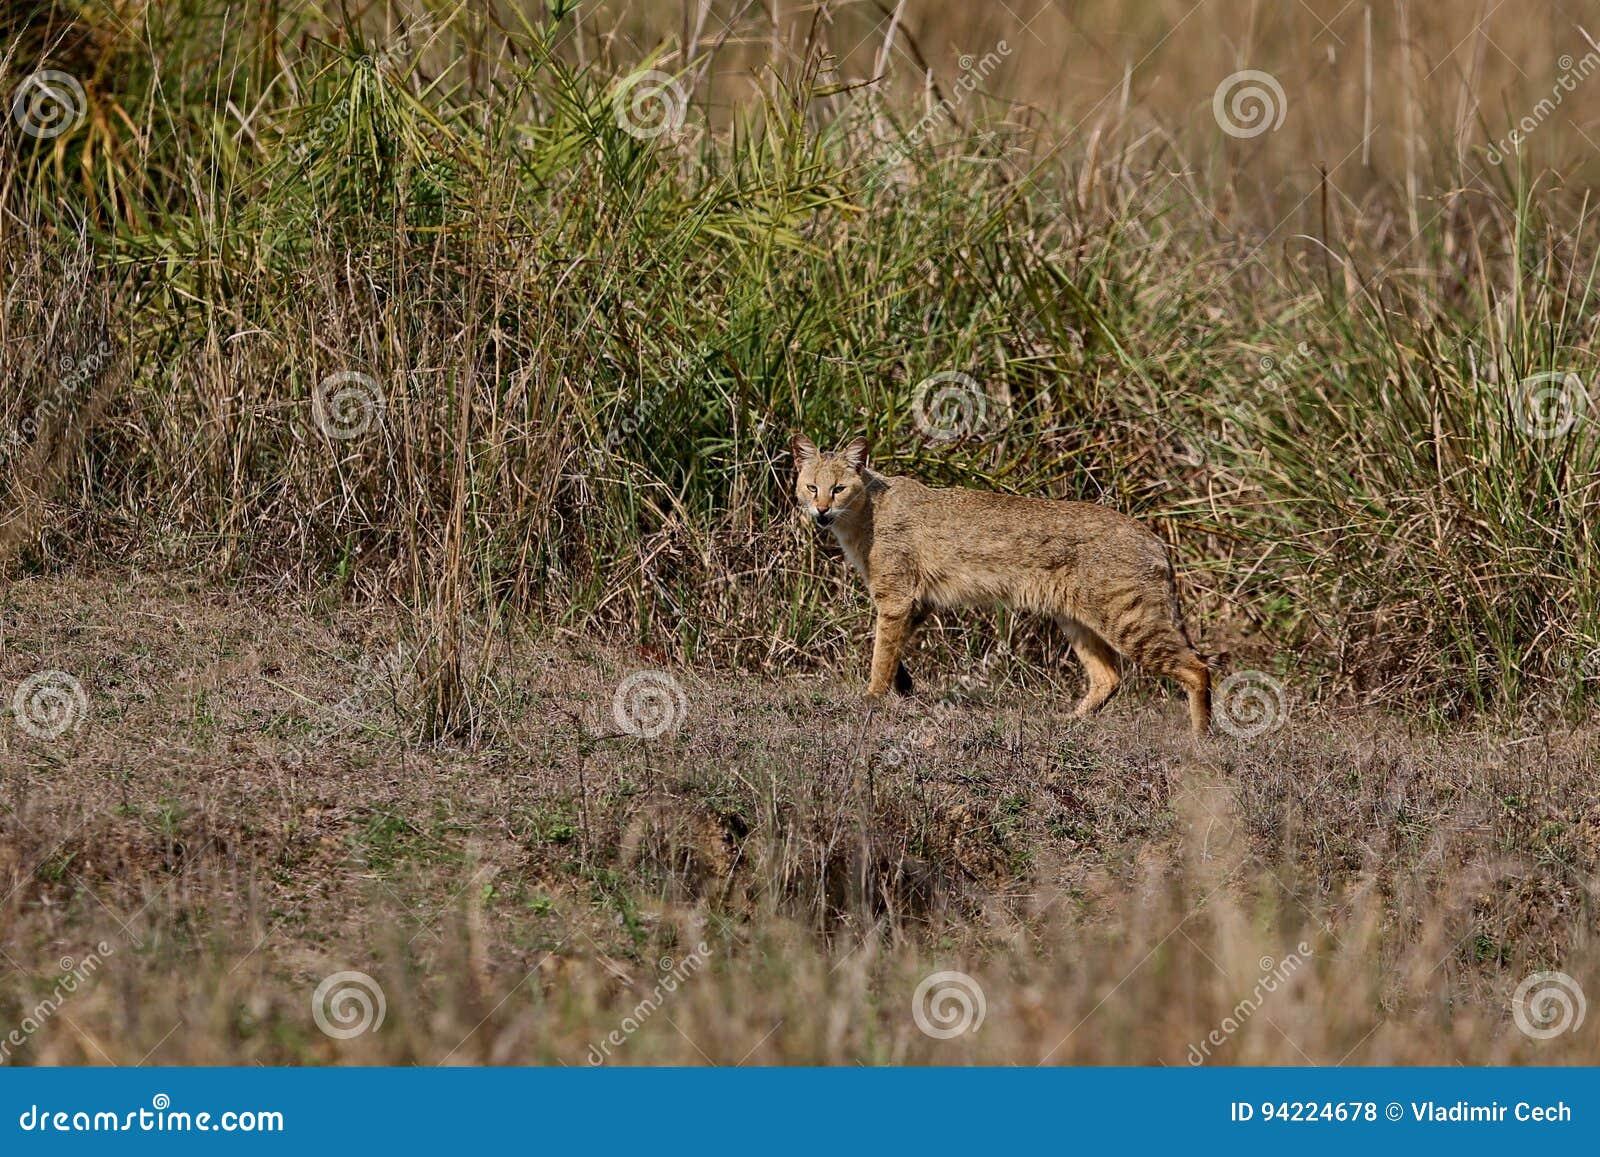 Beautiful jungle cat in the nature habitat in India